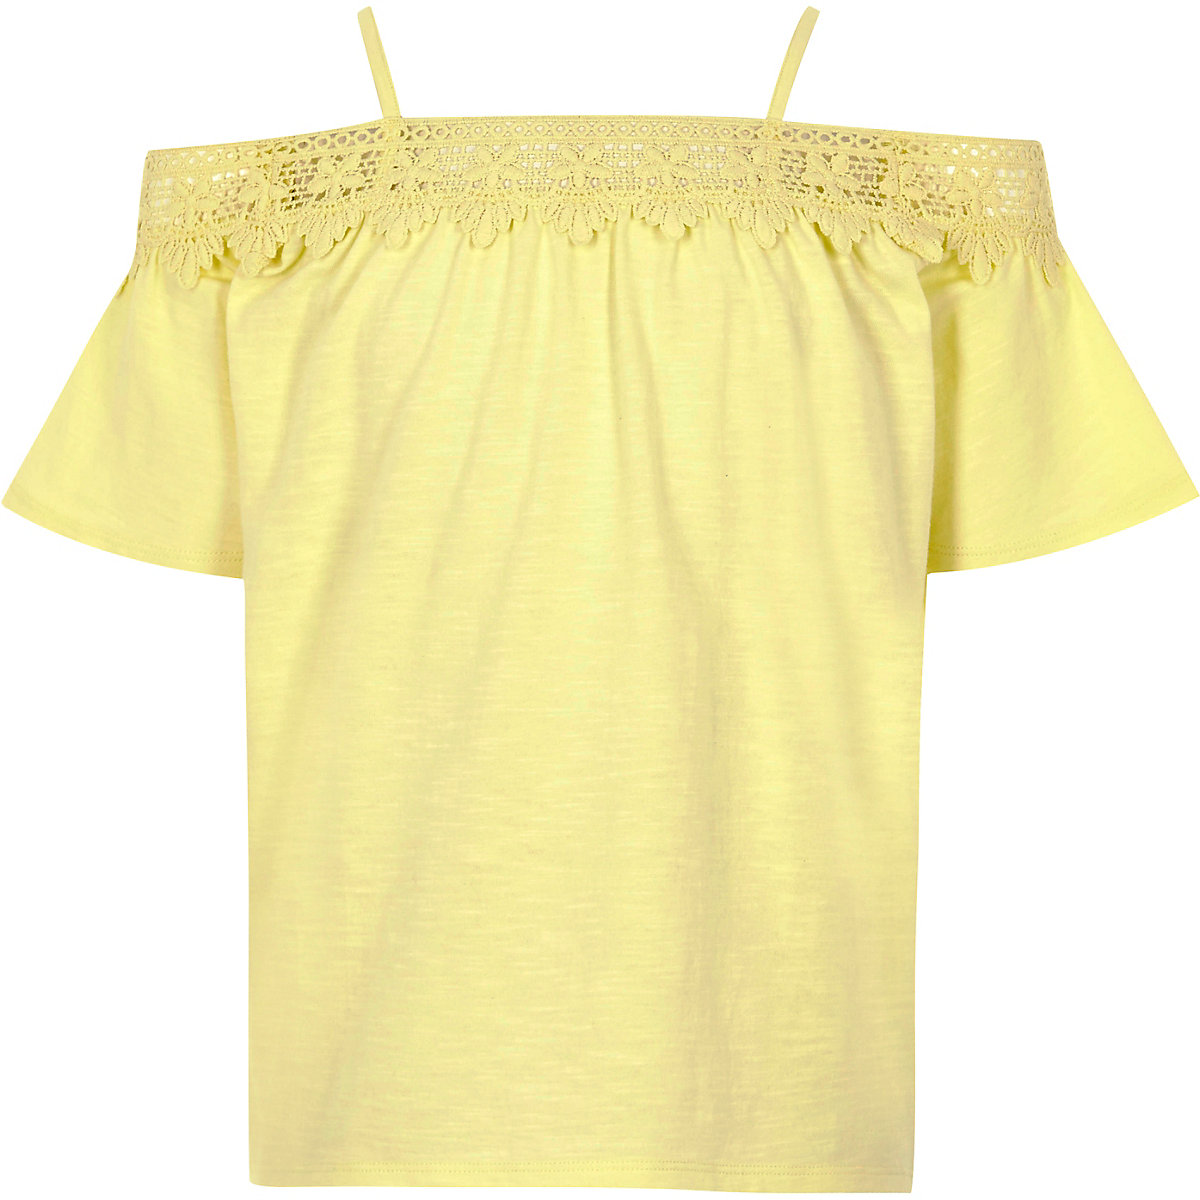 Girls yellow crochet lace bardot top